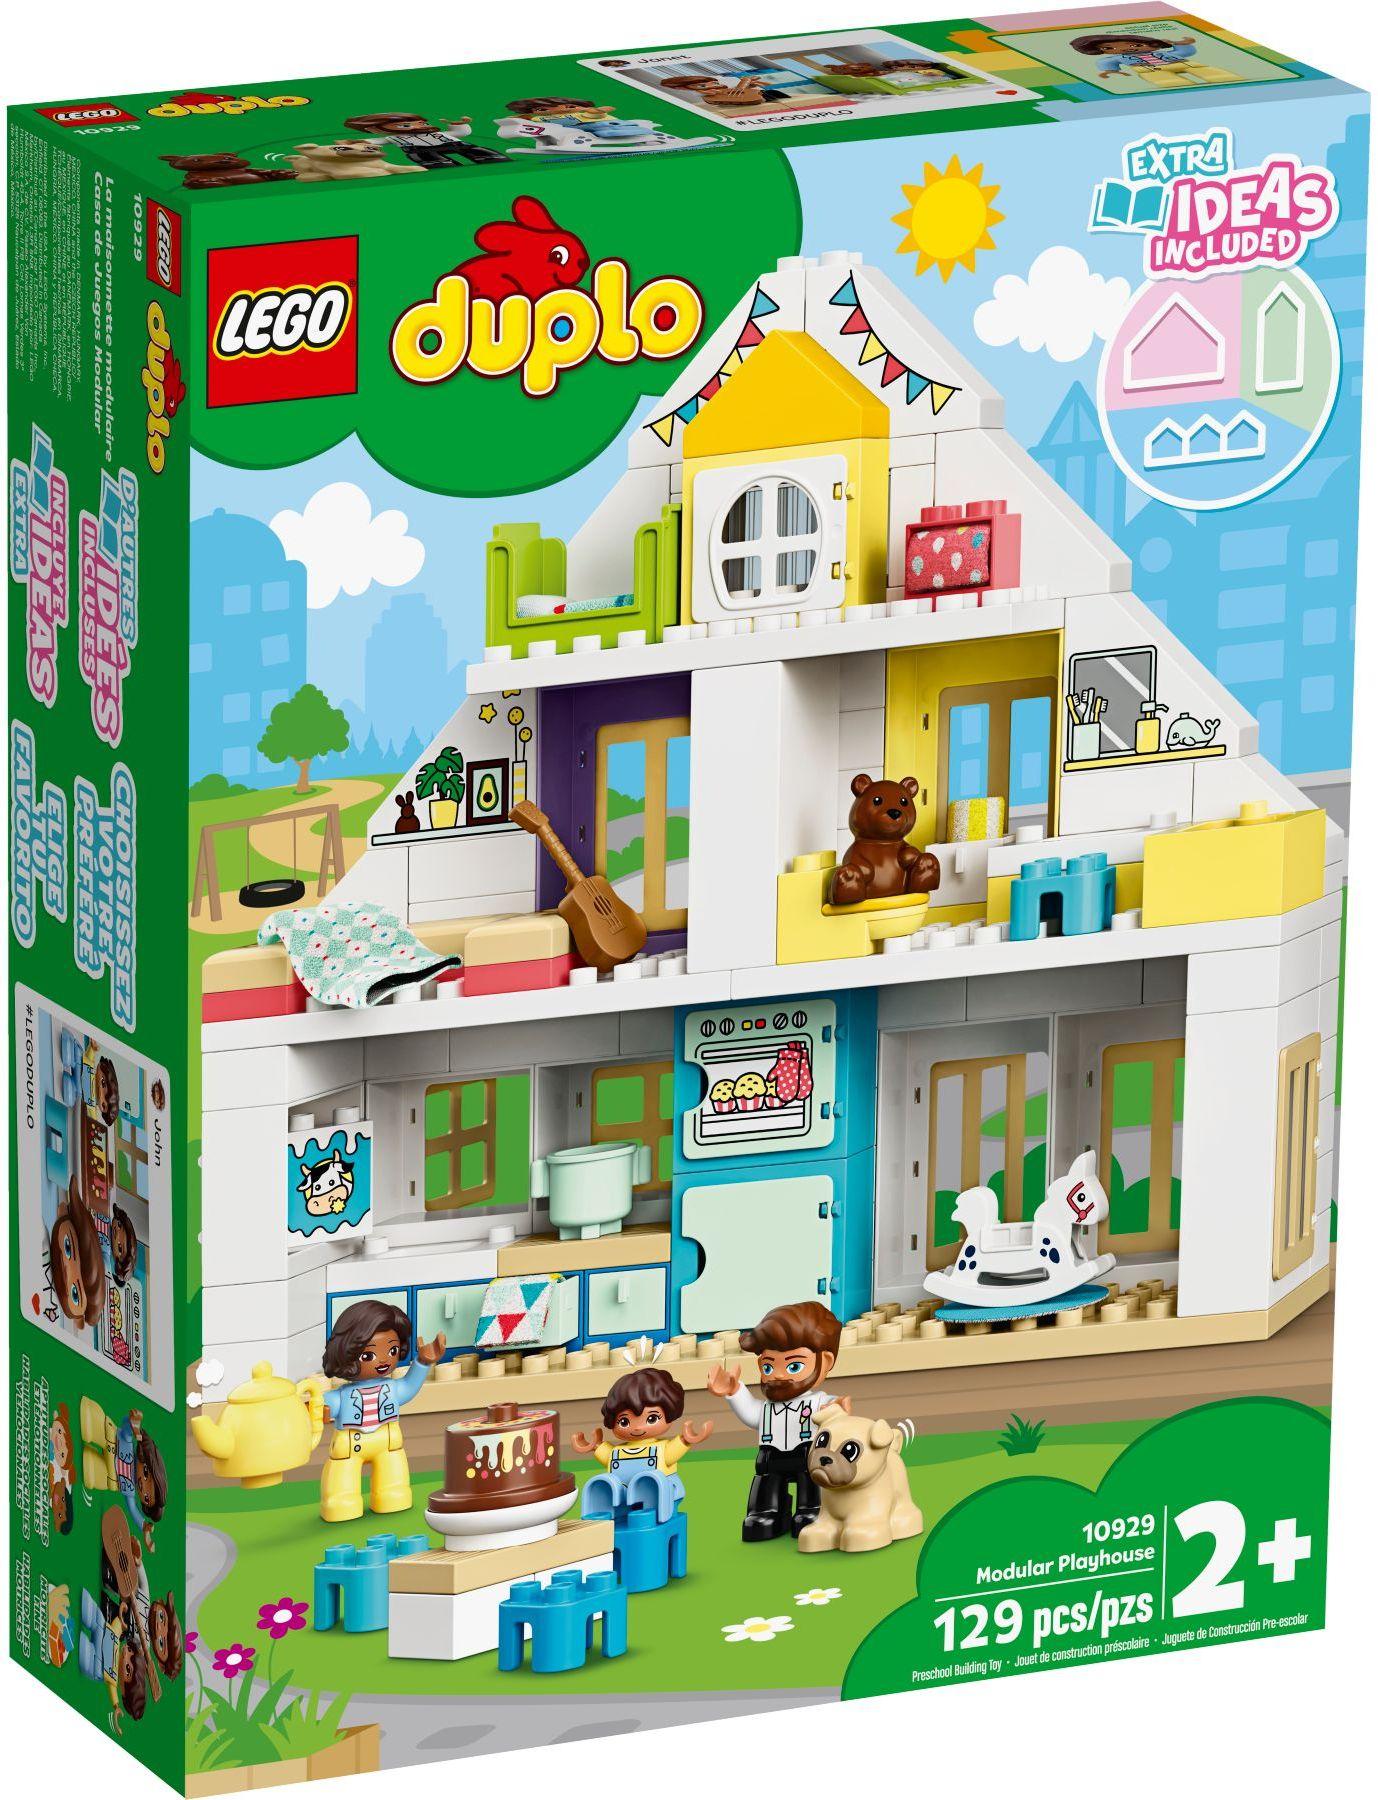 LEGO DUPLO - Modular Playhouse (10929)